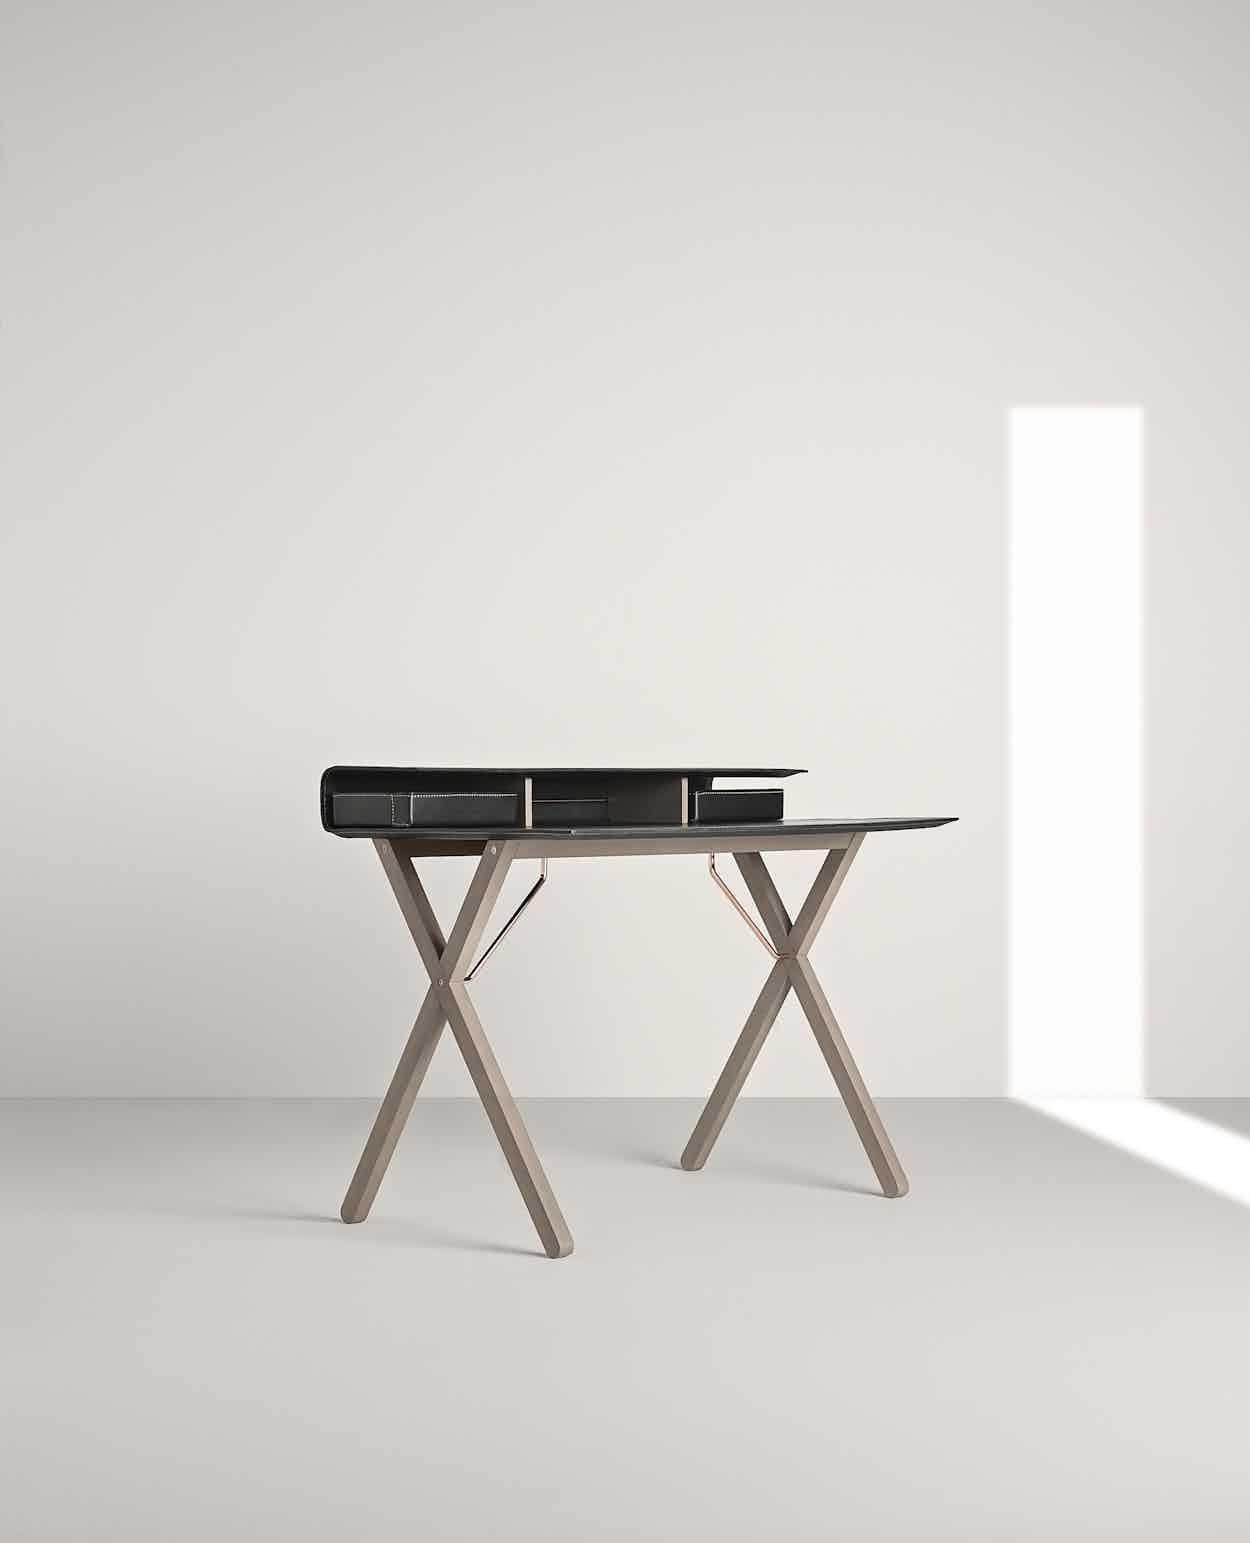 Frag-furniture-black-kant-desk-institu-haute-living